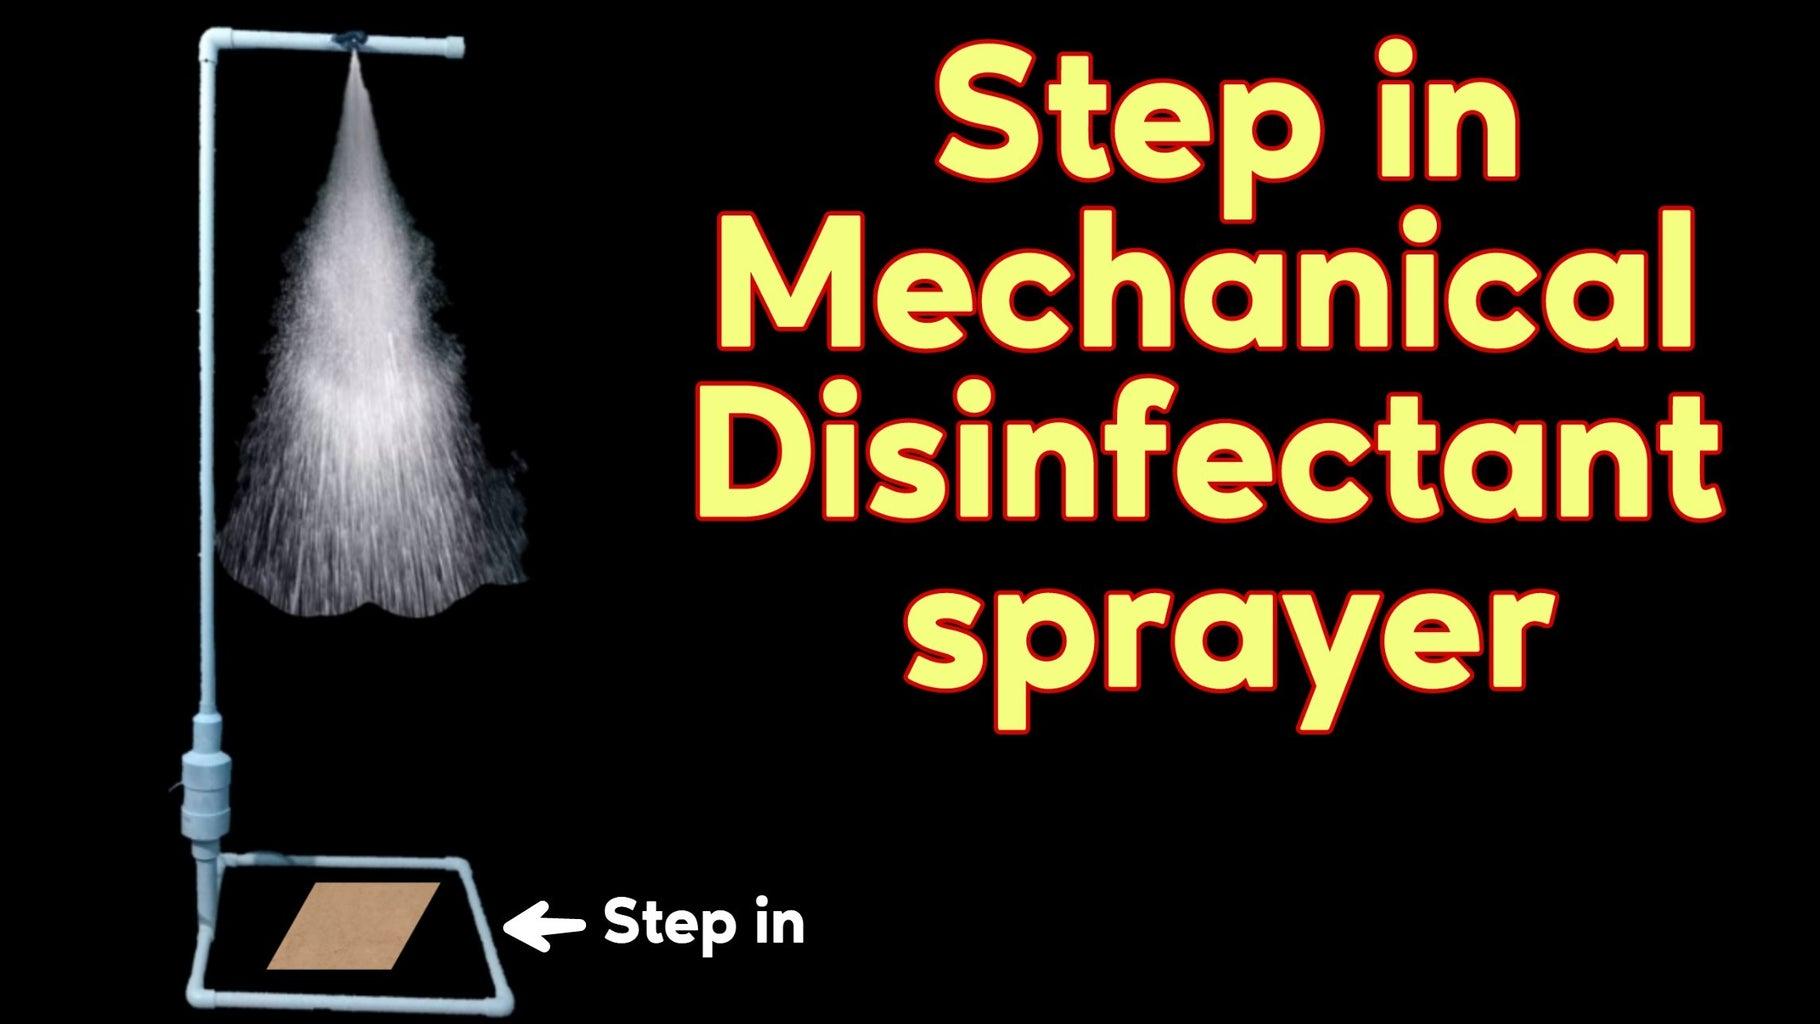 Step in Disinfectant Sprayer